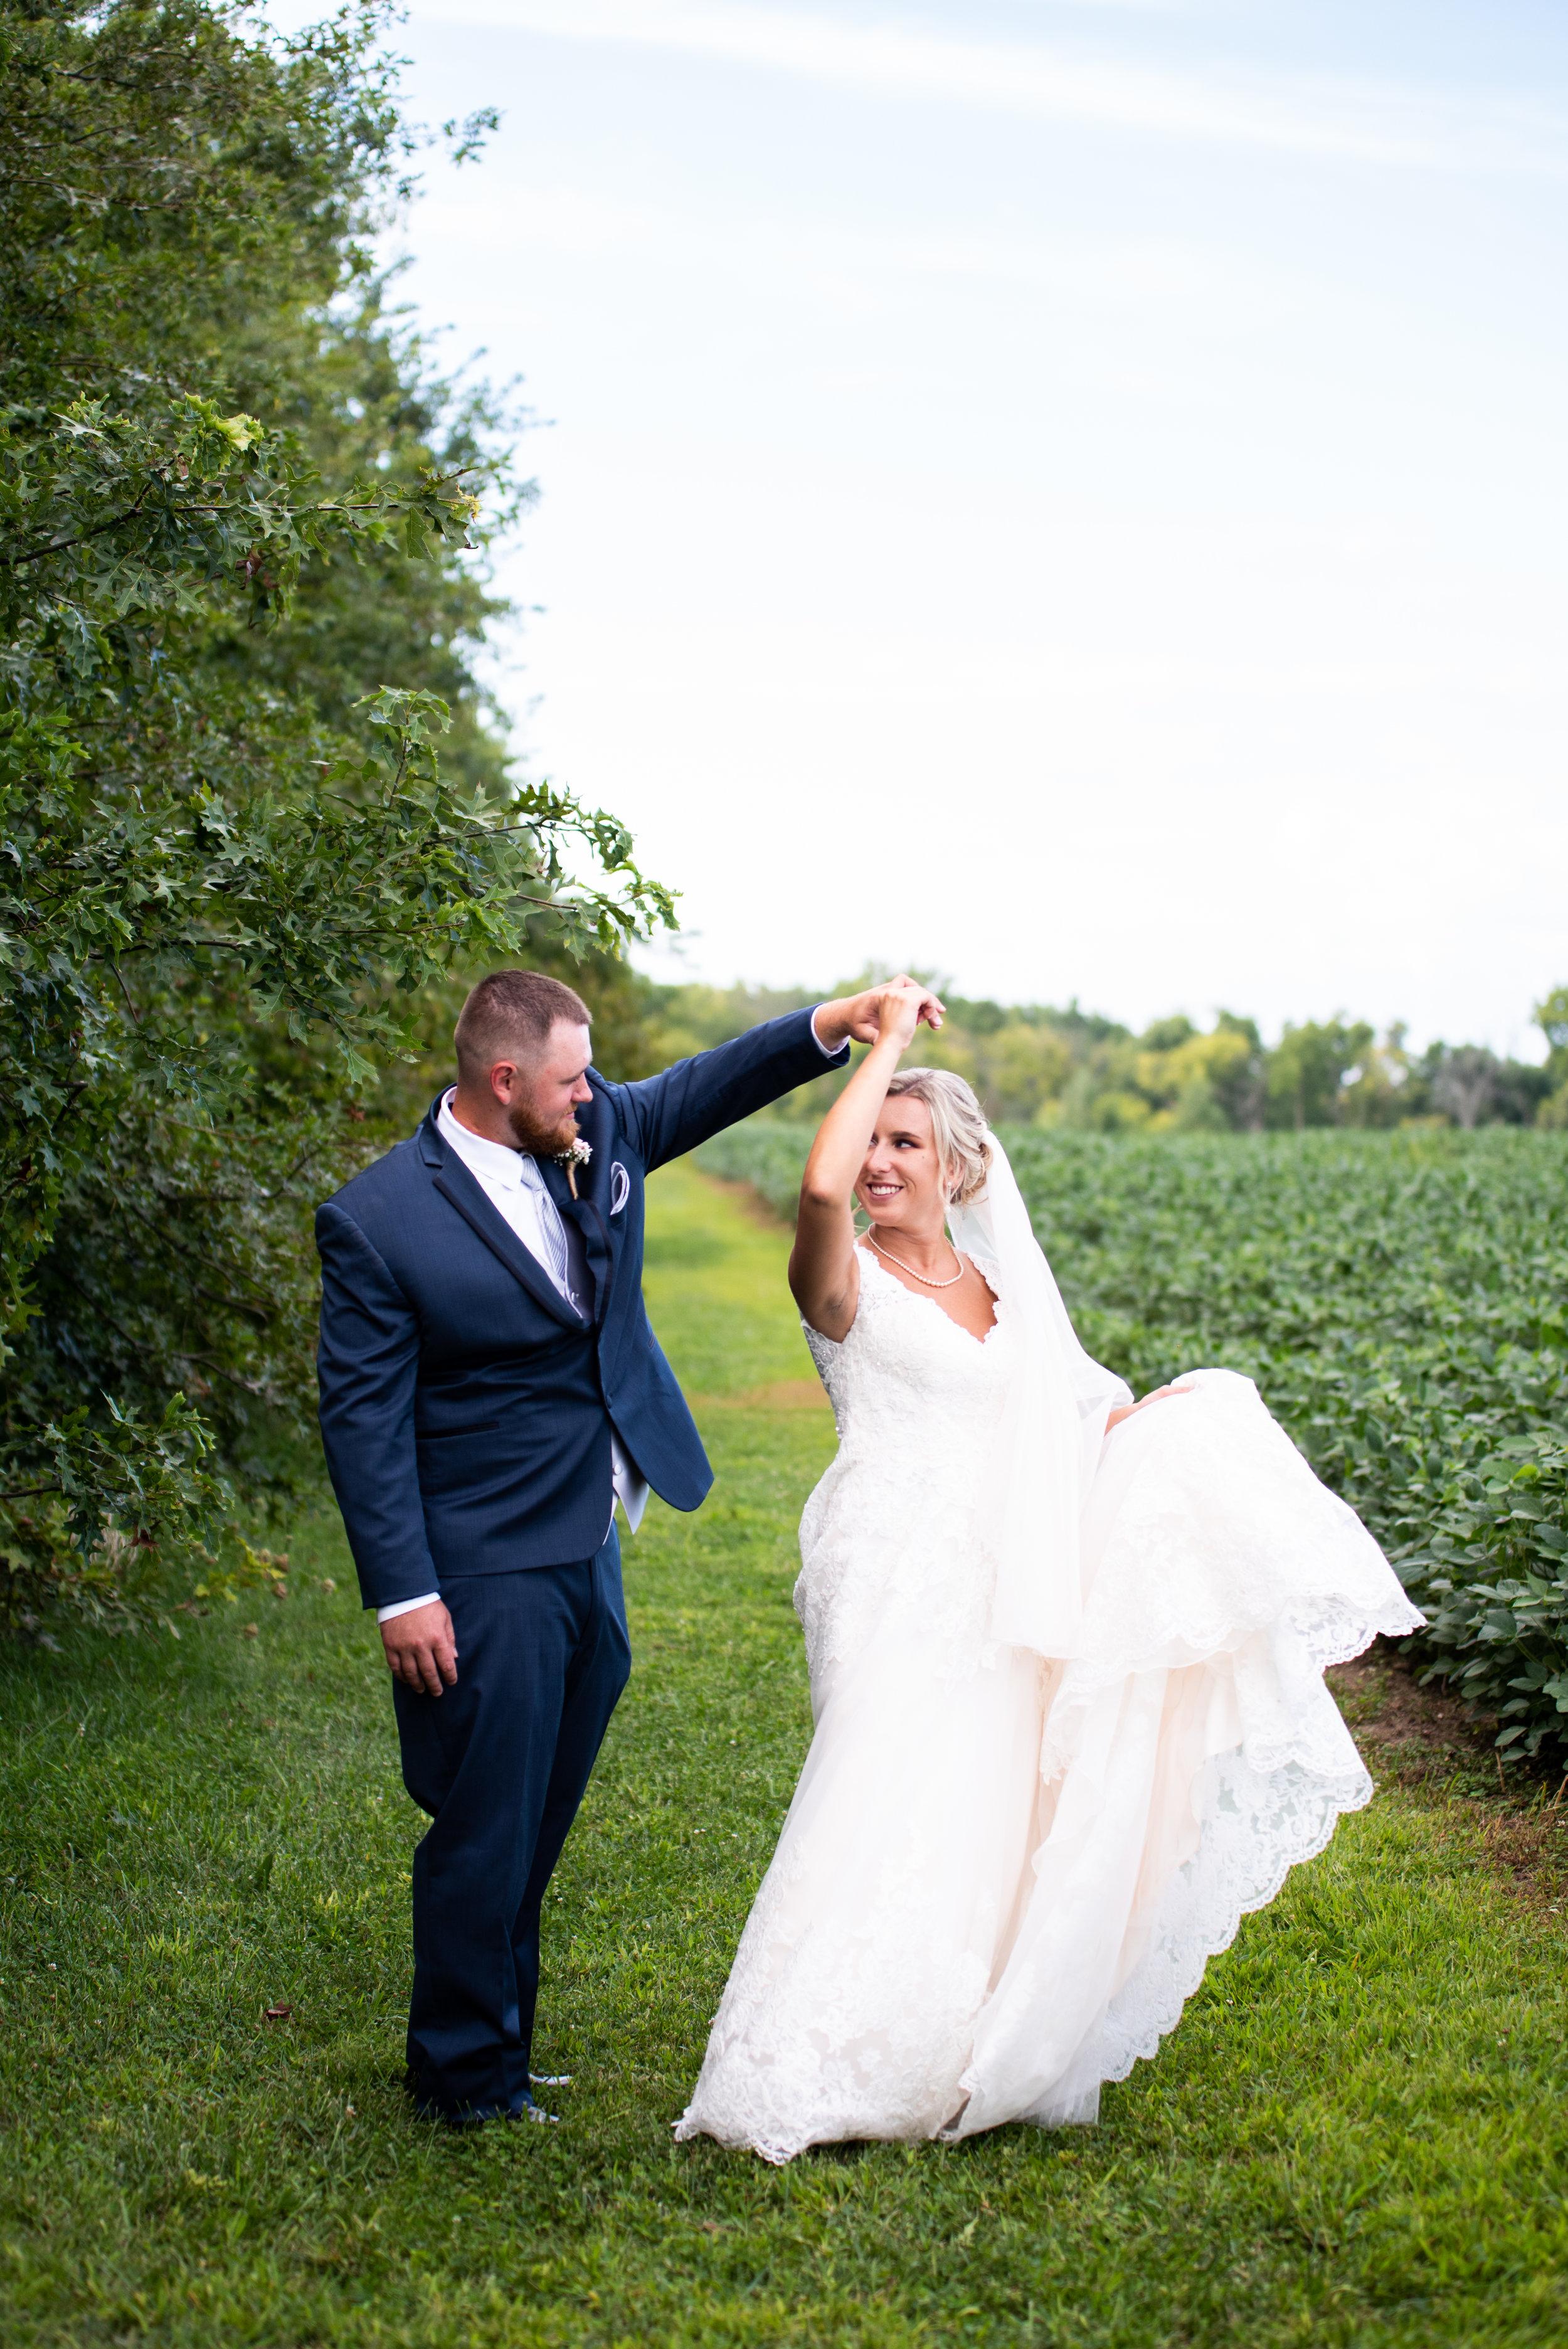 wedding (1 of 1)-159.jpg